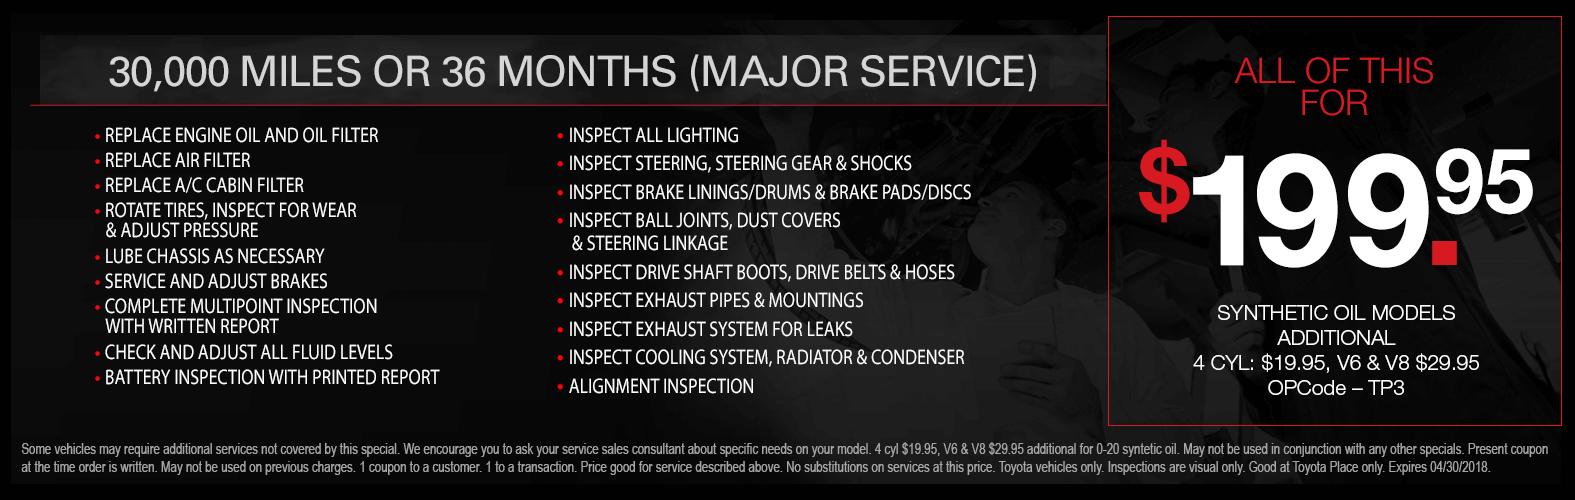 Toyota Major Service Special